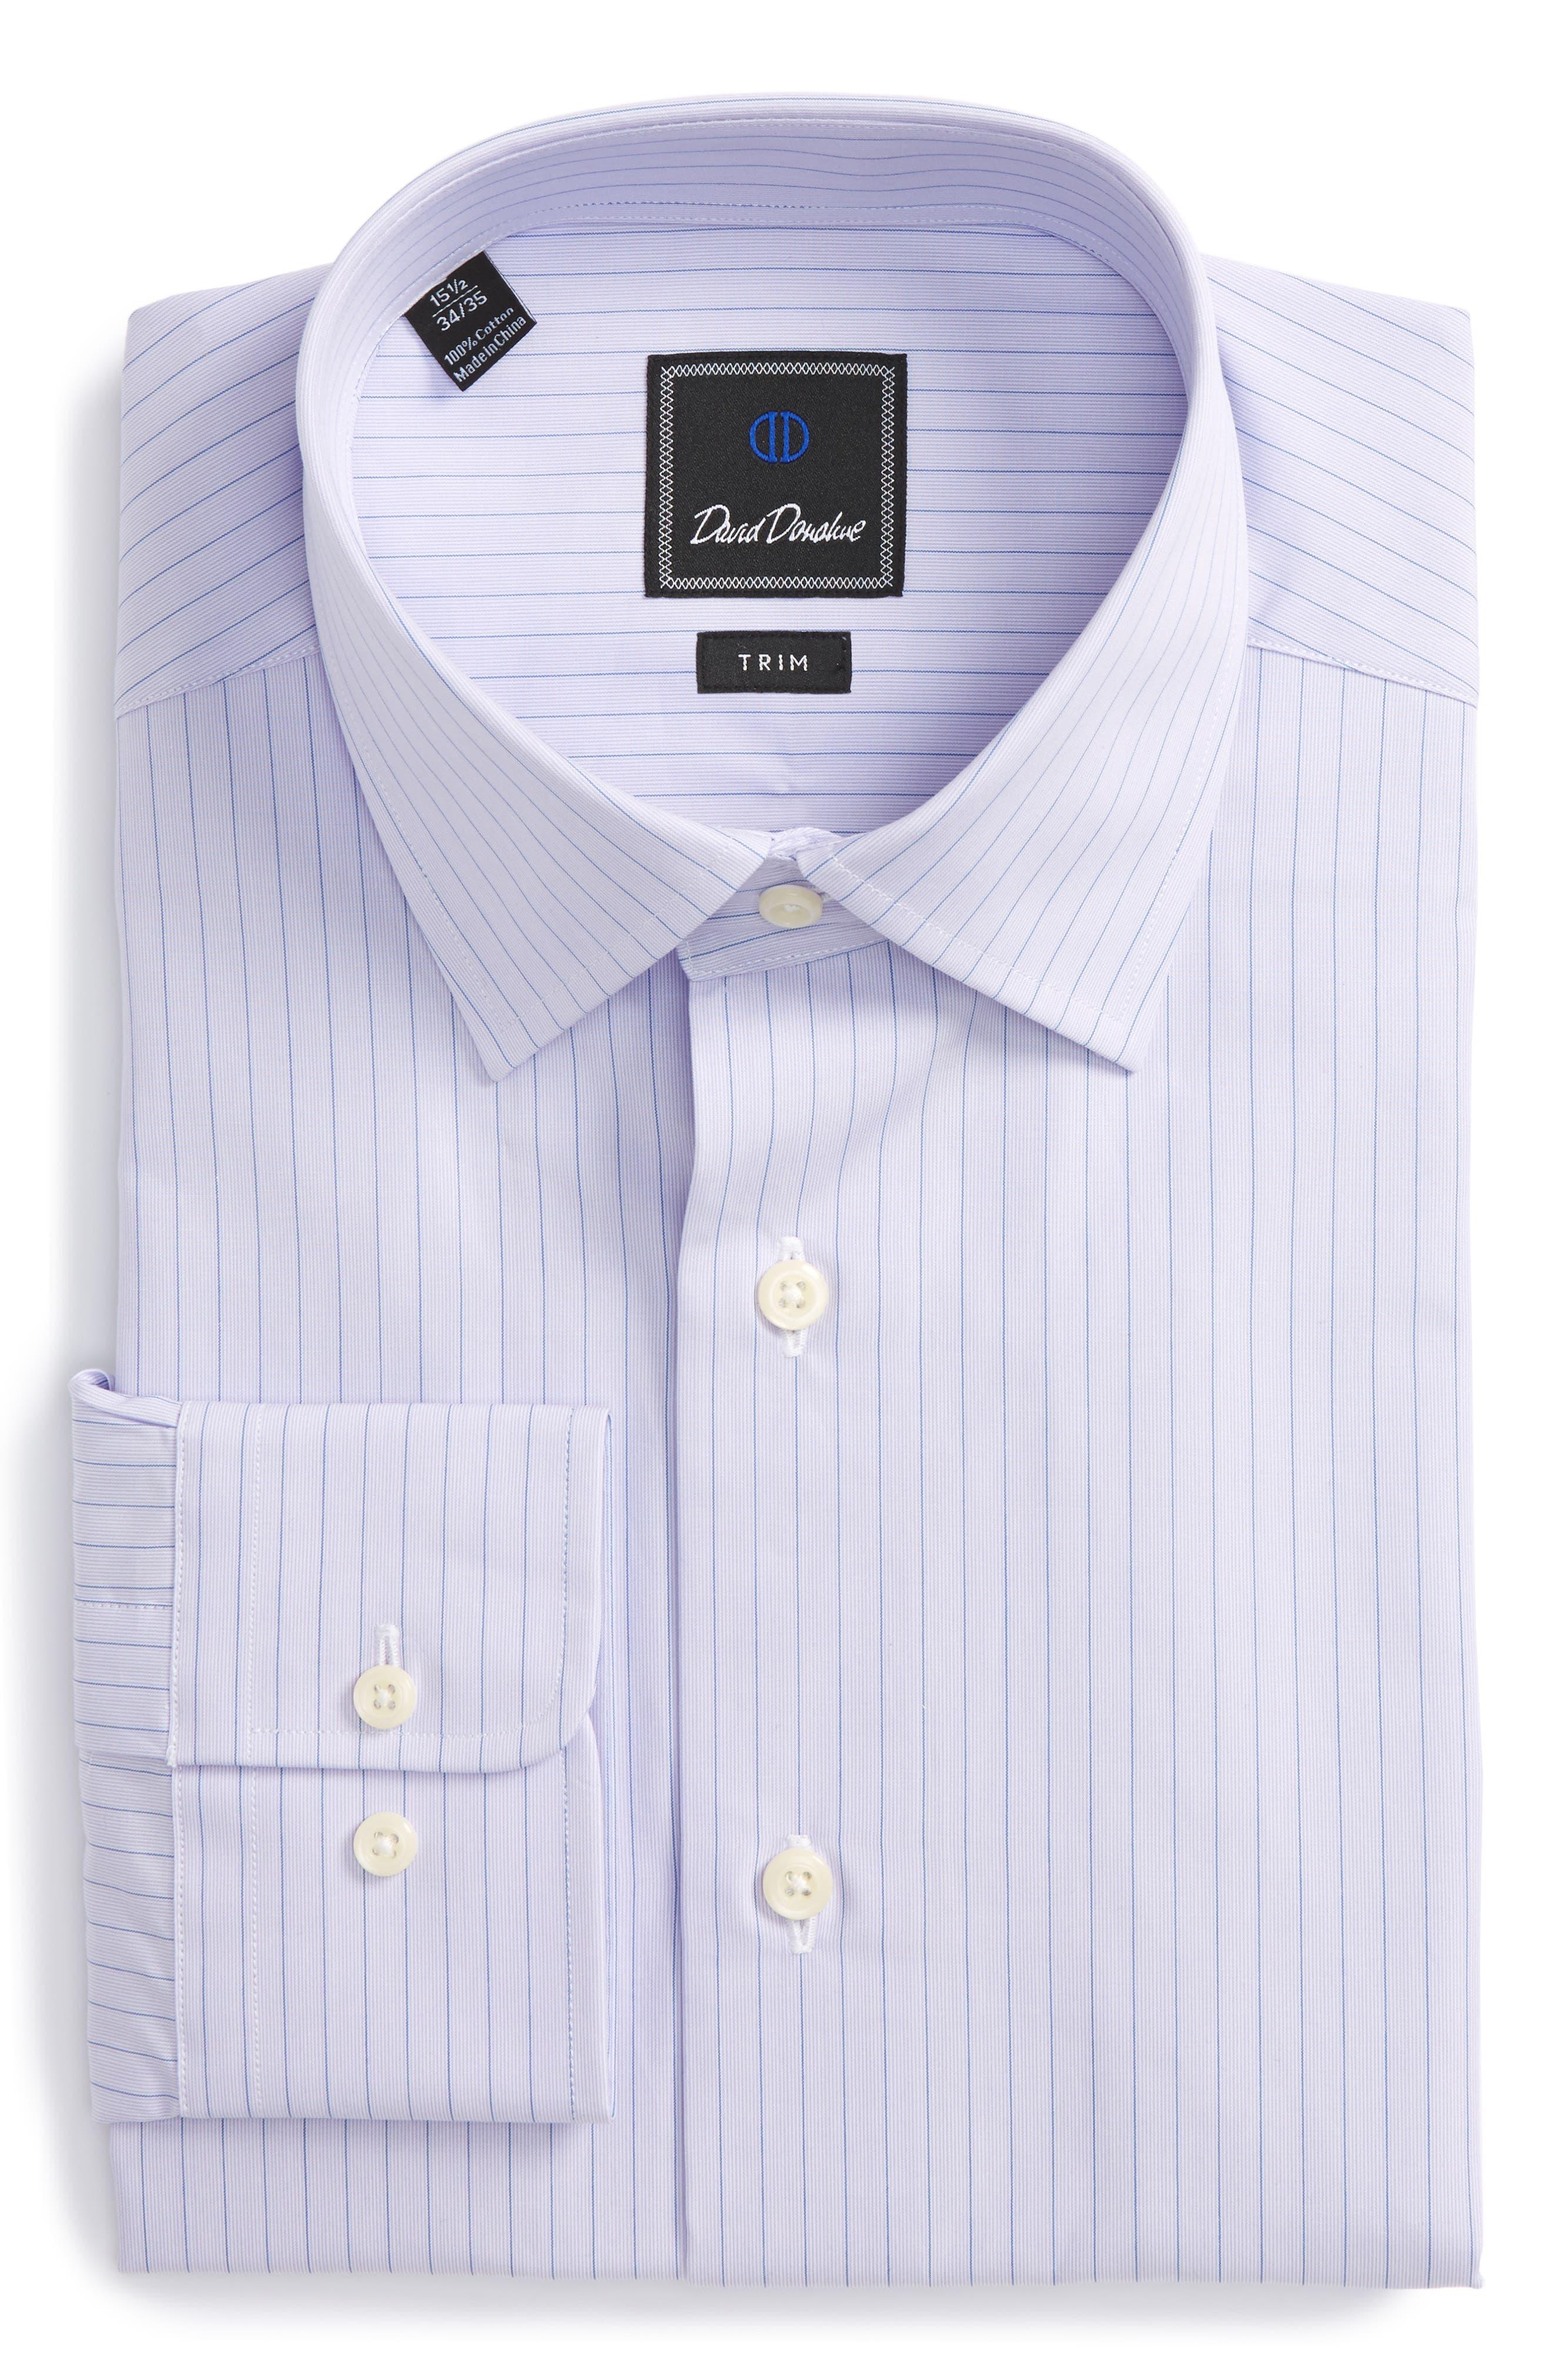 DAVID DONAHUE Trim Fit Stripe Dress Shirt